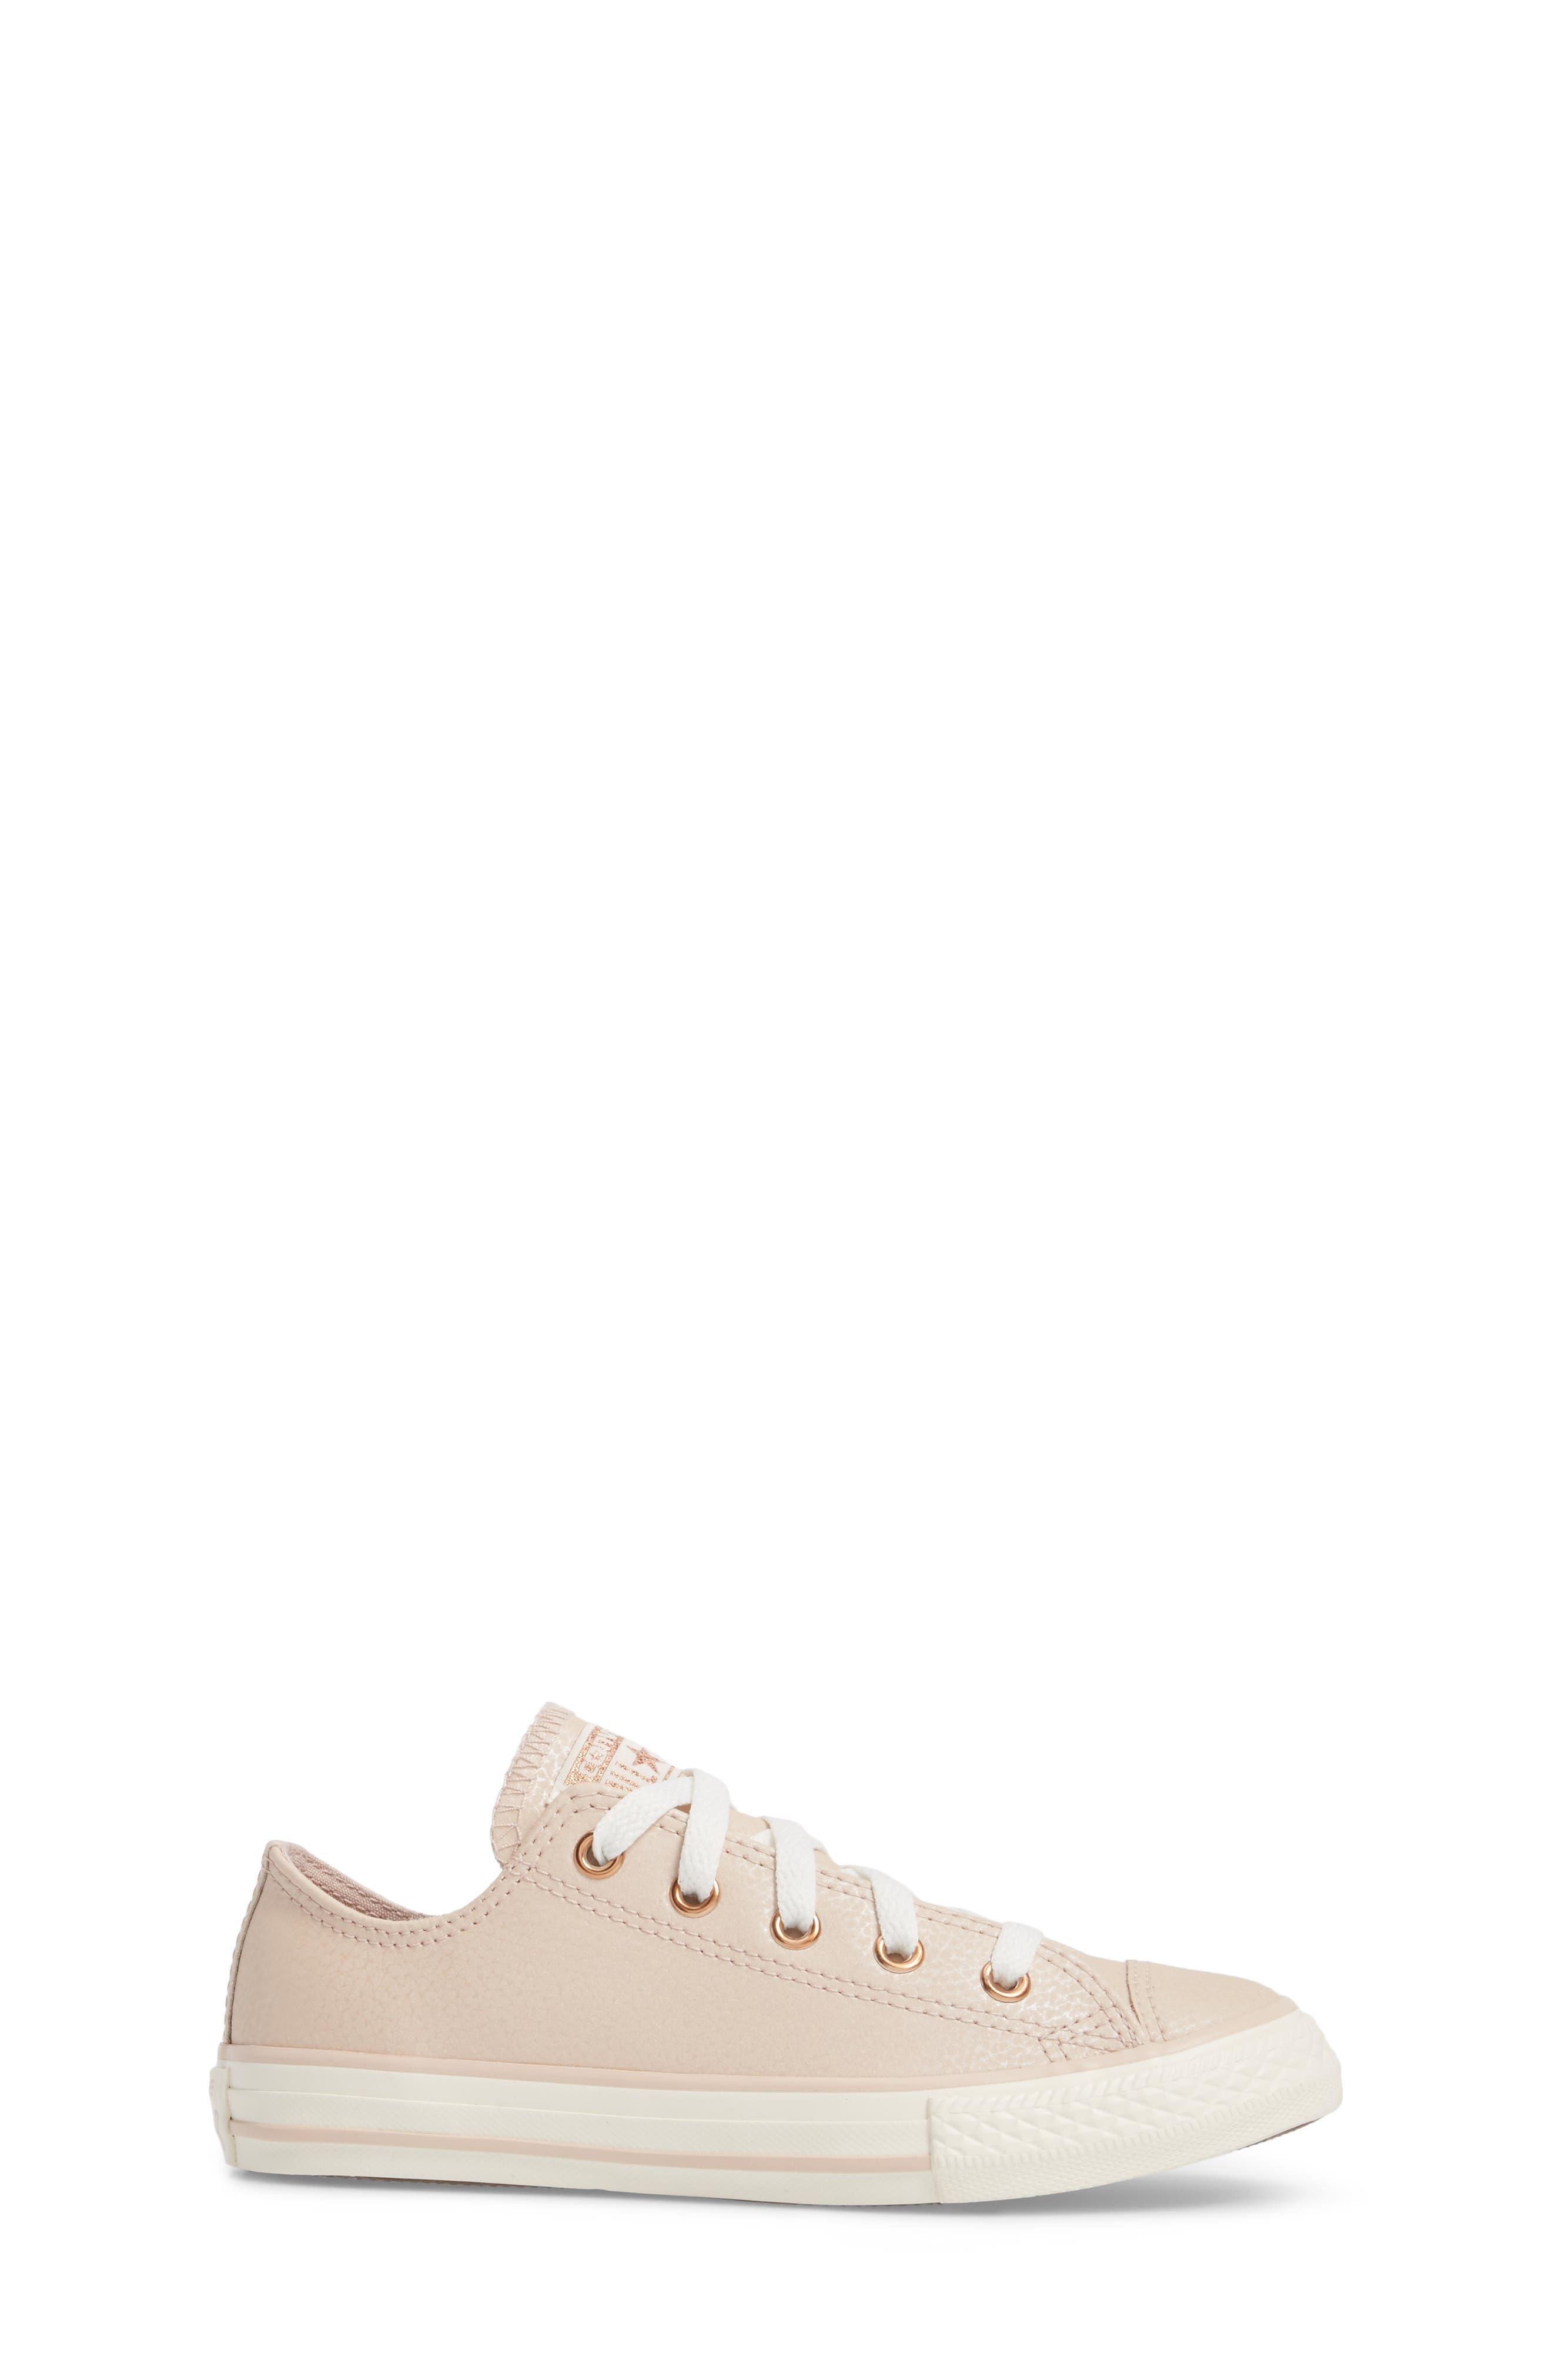 Alternate Image 3  - Converse All Star® Fashion Low Top Sneaker (Toddler, Little Kid & Big Kid)